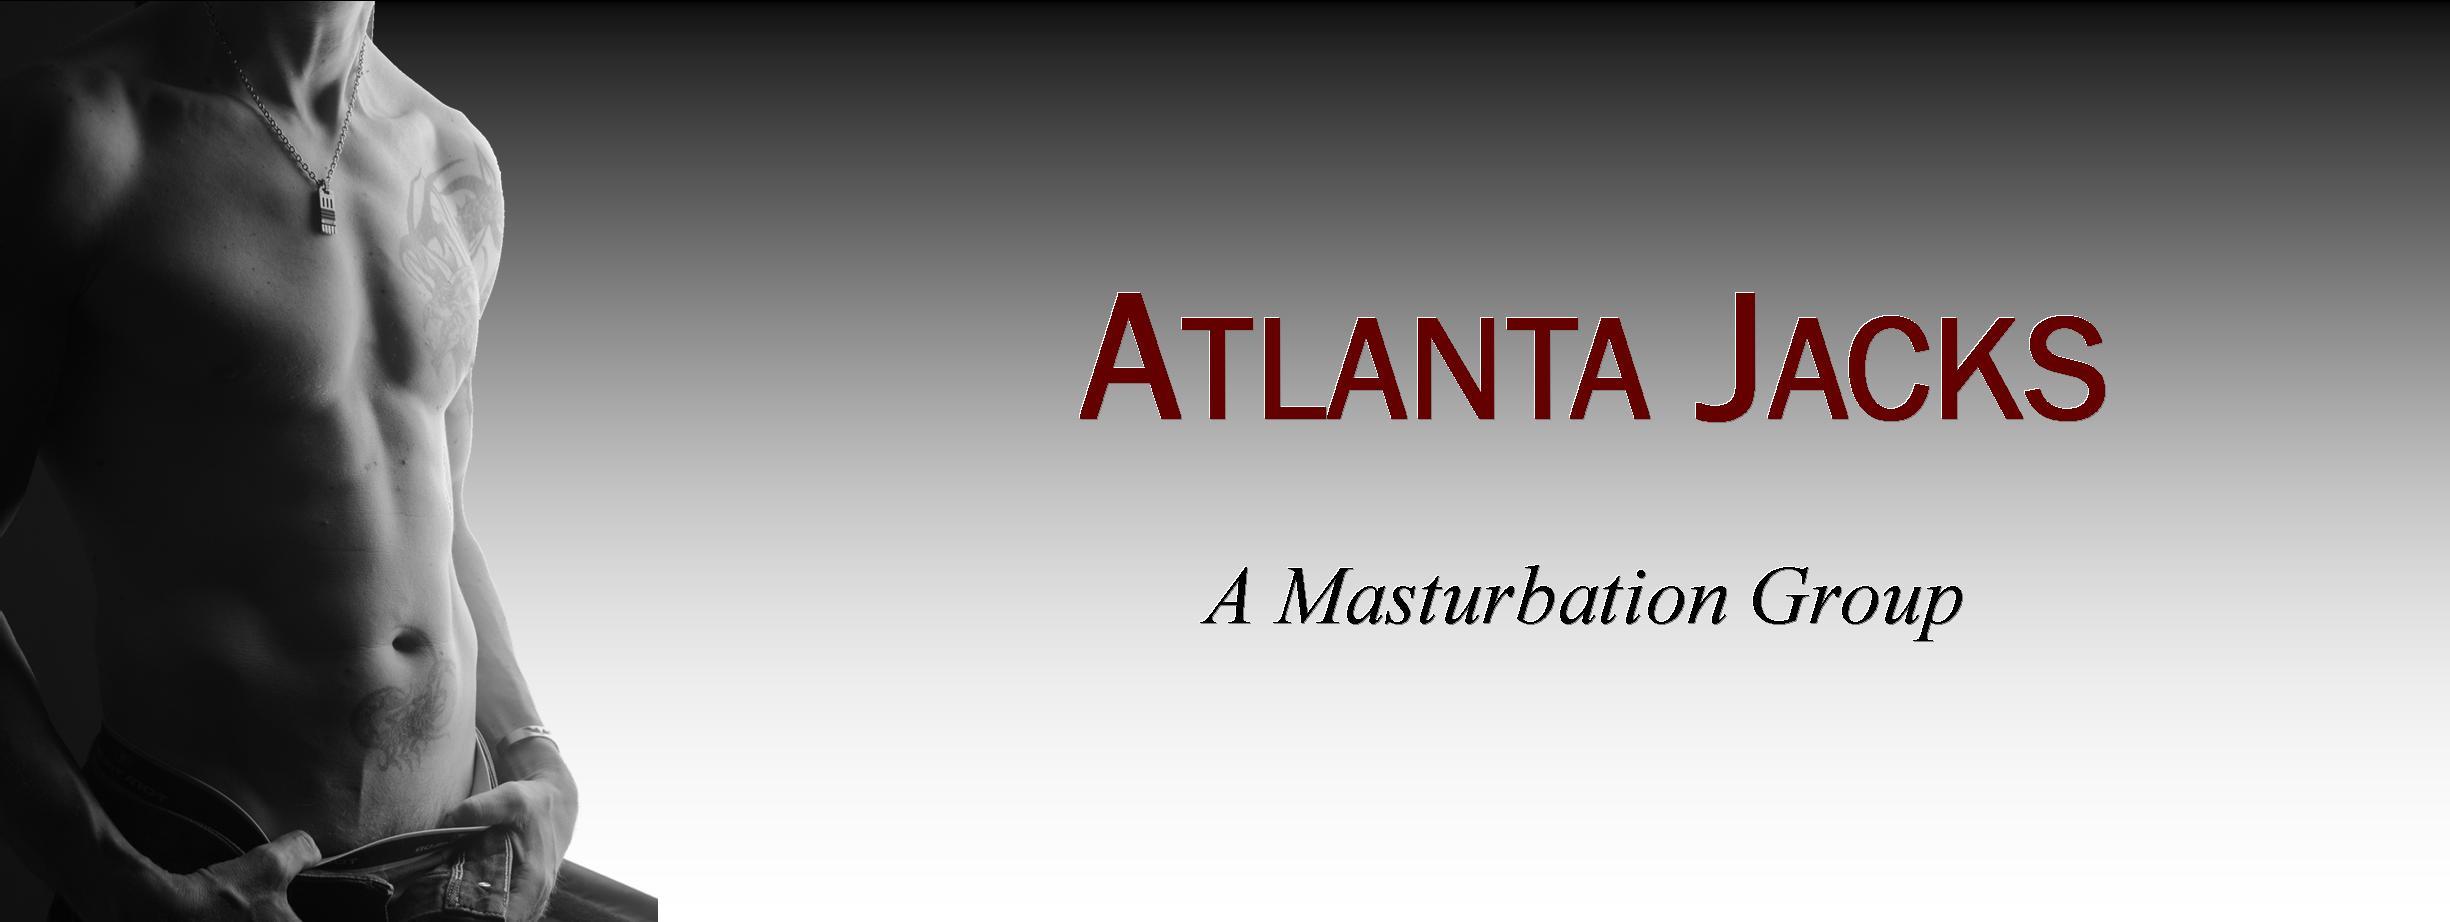 Atlanta Jacks